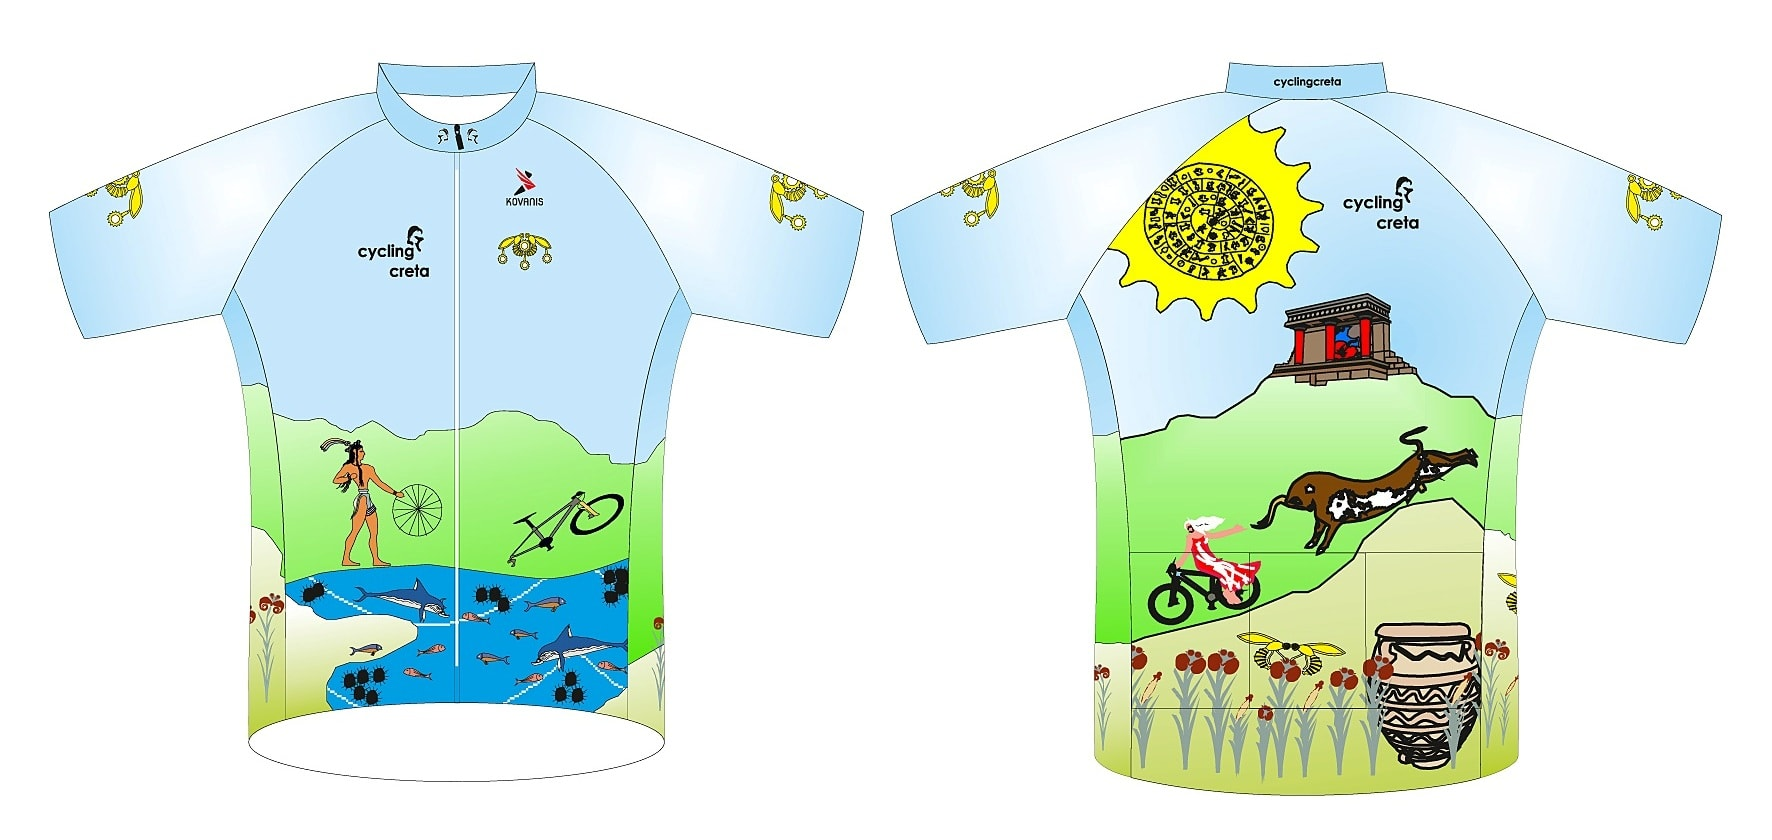 cyclingcreta jersey knossos